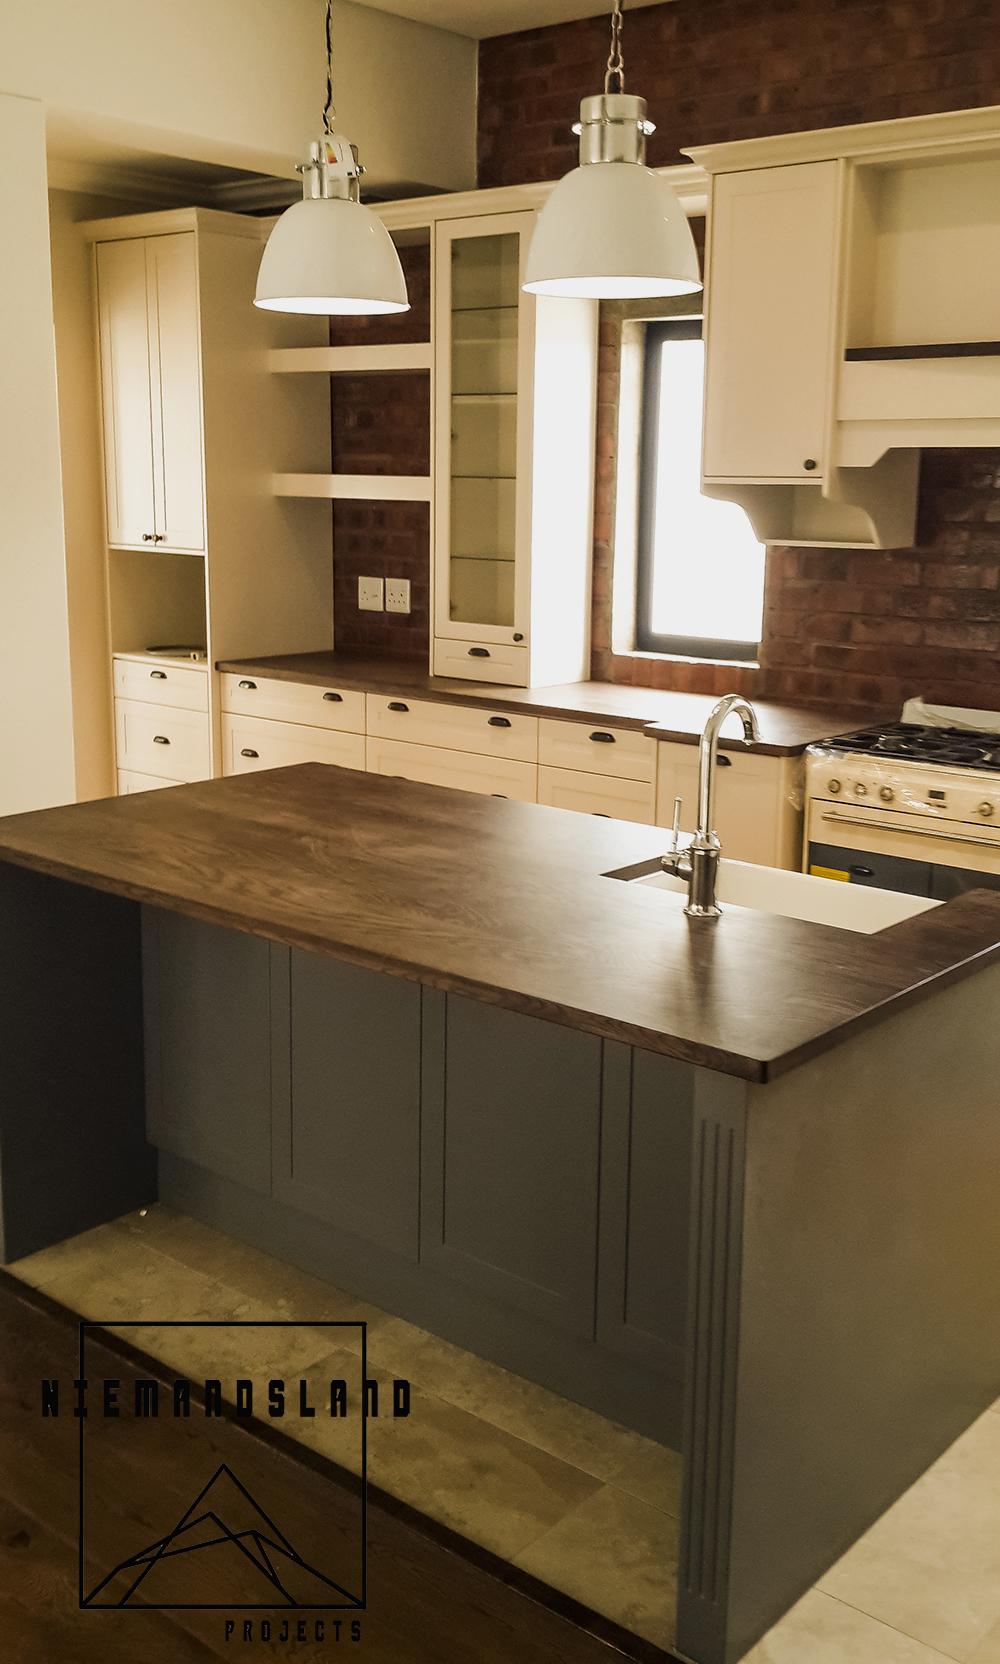 Niemandsland - Cadan cupboards - interior finish